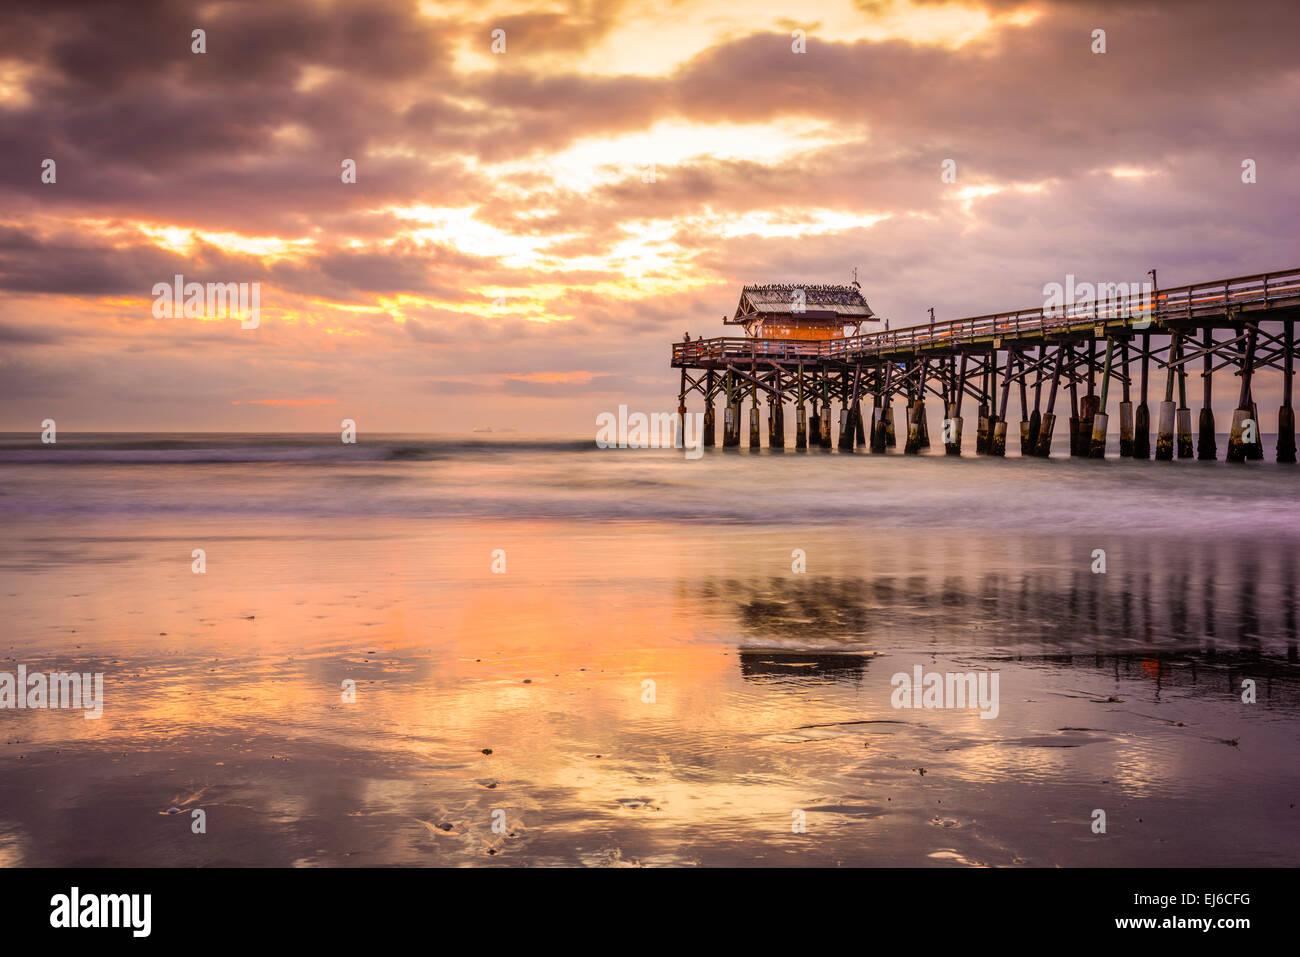 Cocoa Beach, Florida, USA Strand und Pier bei Sonnenaufgang. Stockbild